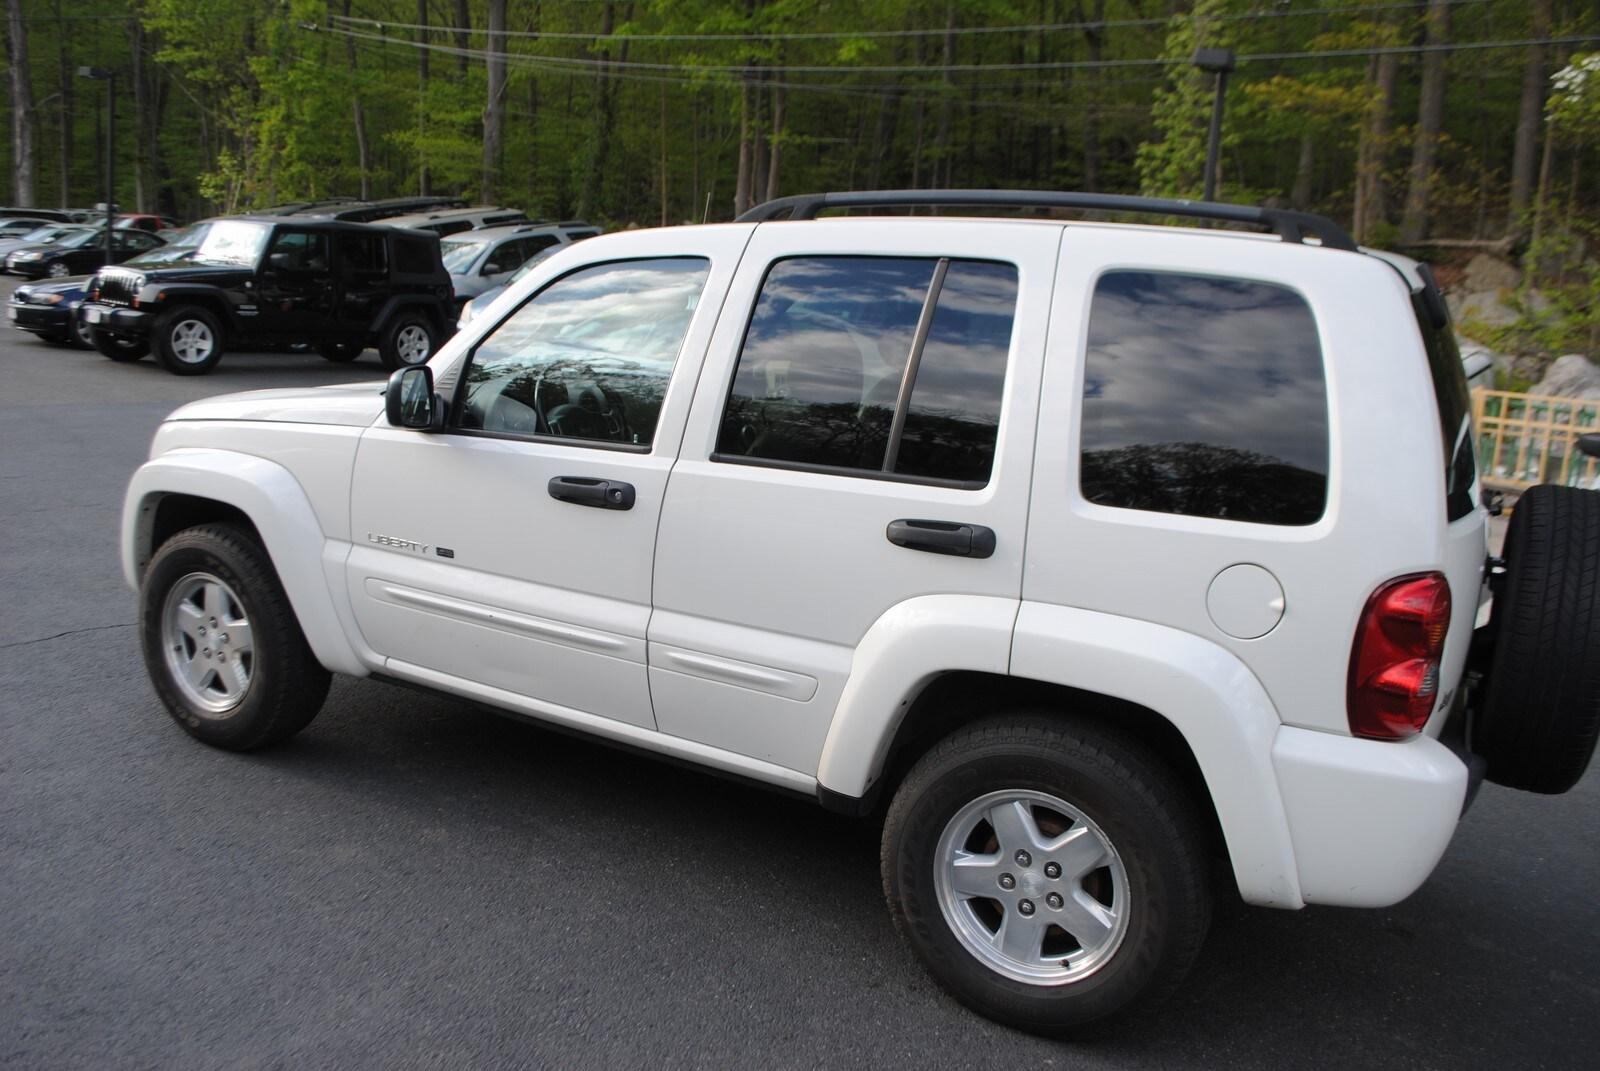 ... 2002 Jeep Liberty Limited Edition 3.7 SUV ...